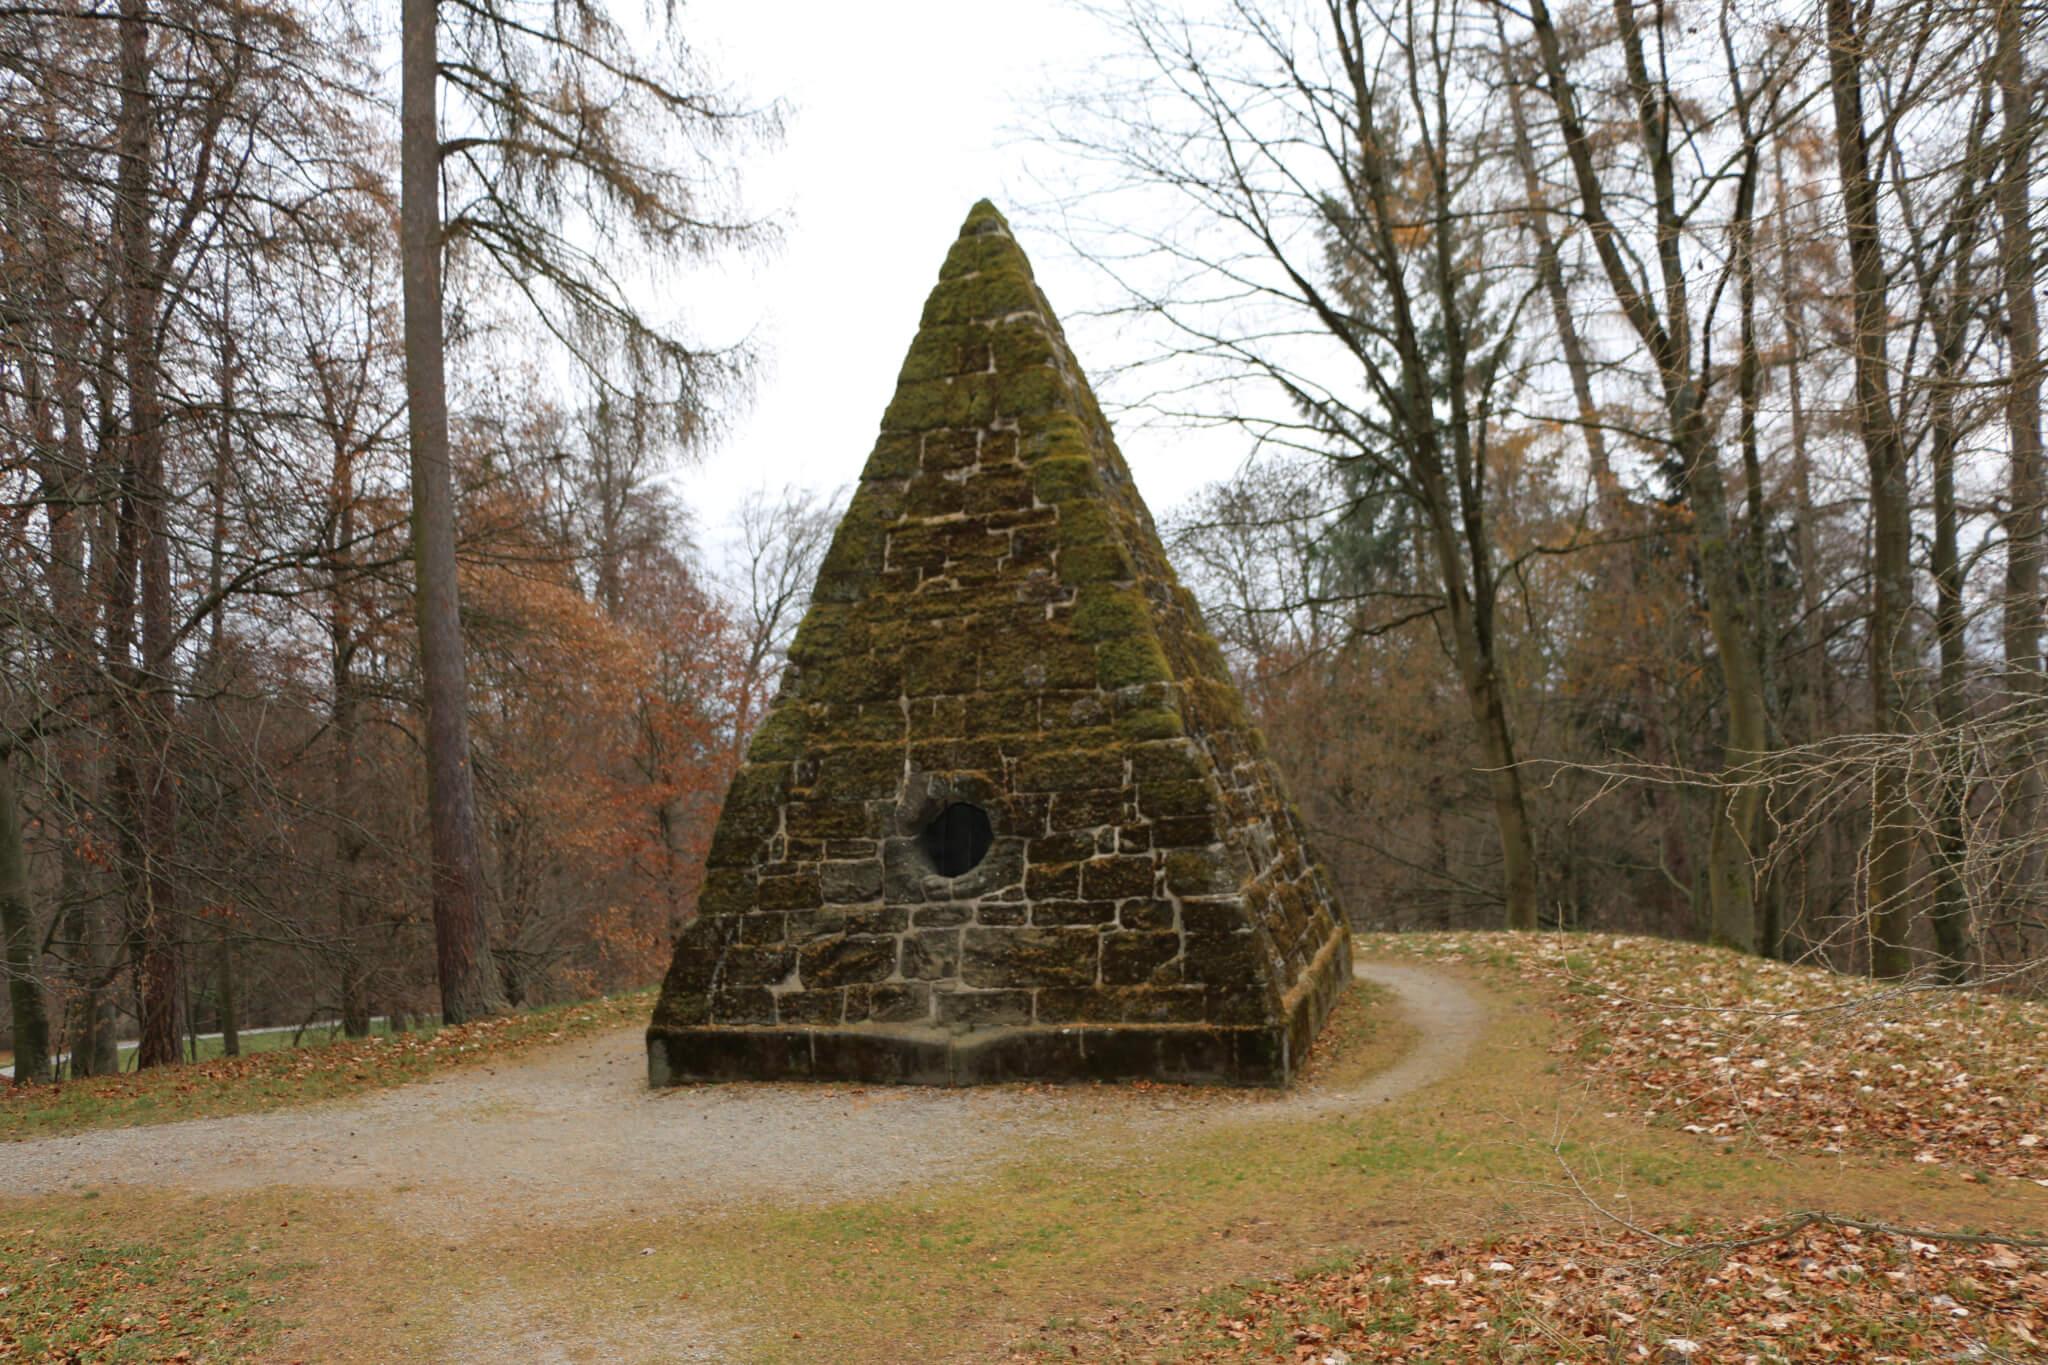 Cestius-Pyramide, Bergpark Wilhelmshöhe, Kassel